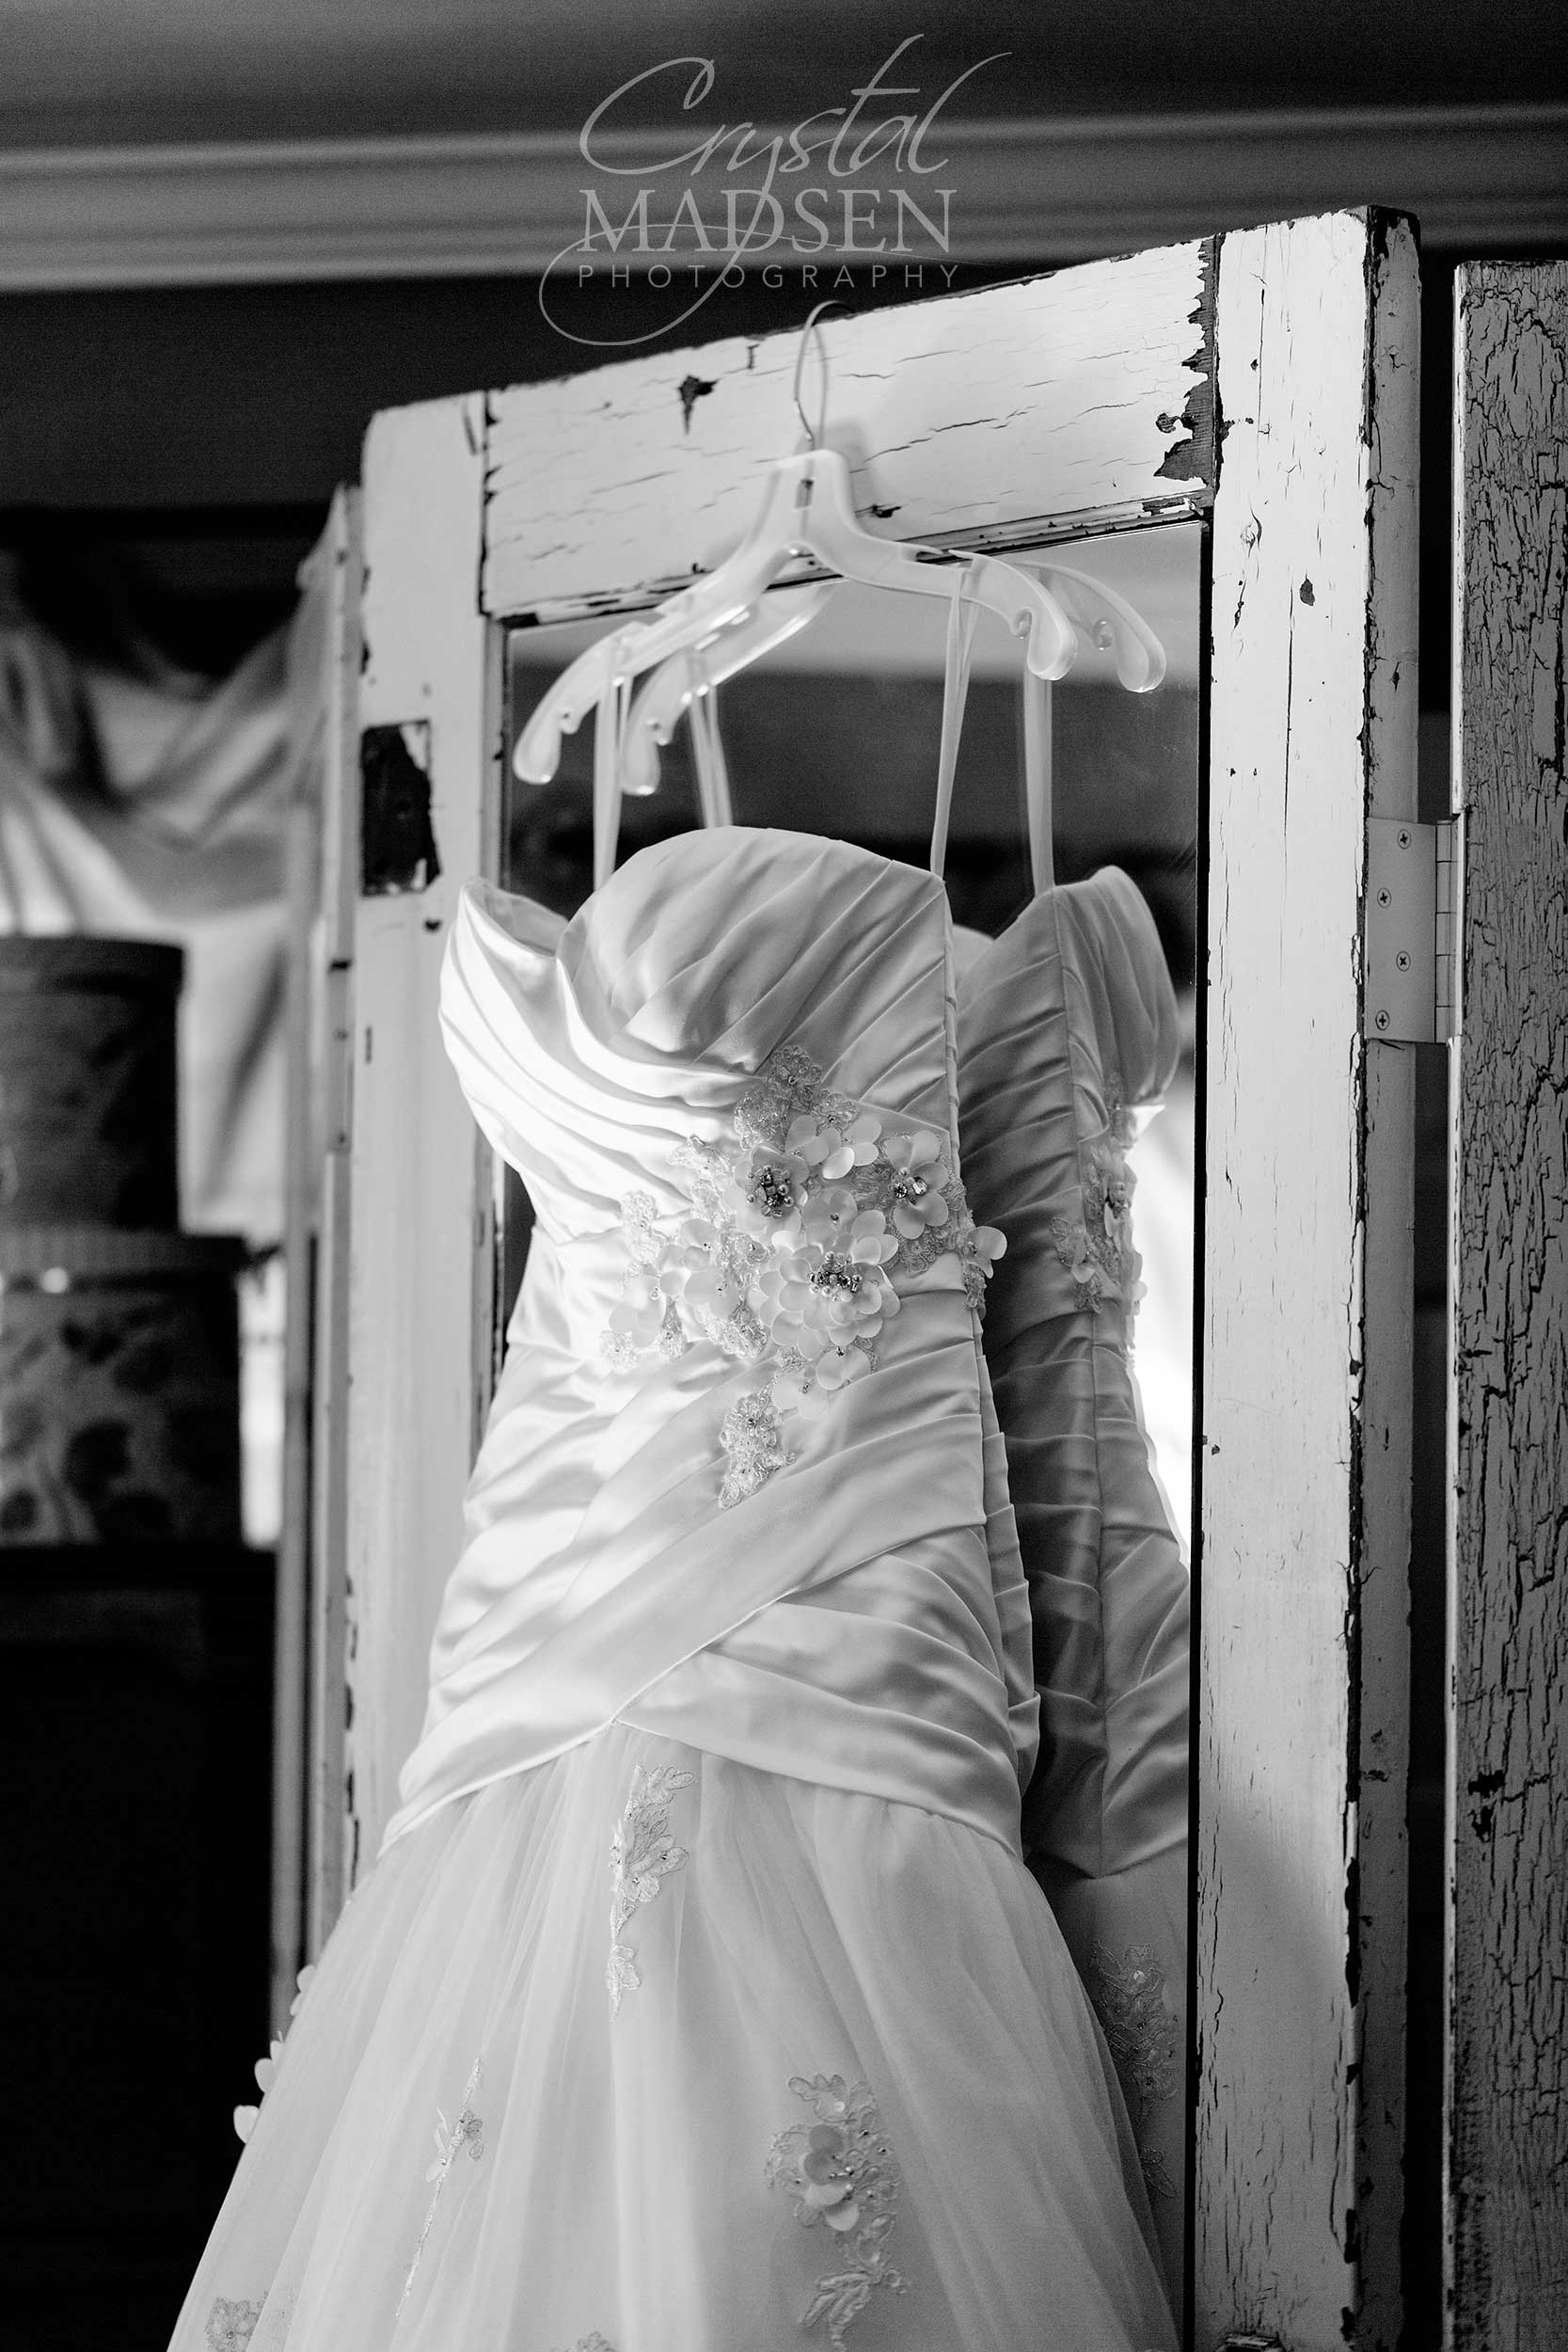 Wedding Photograpy Spokane wa